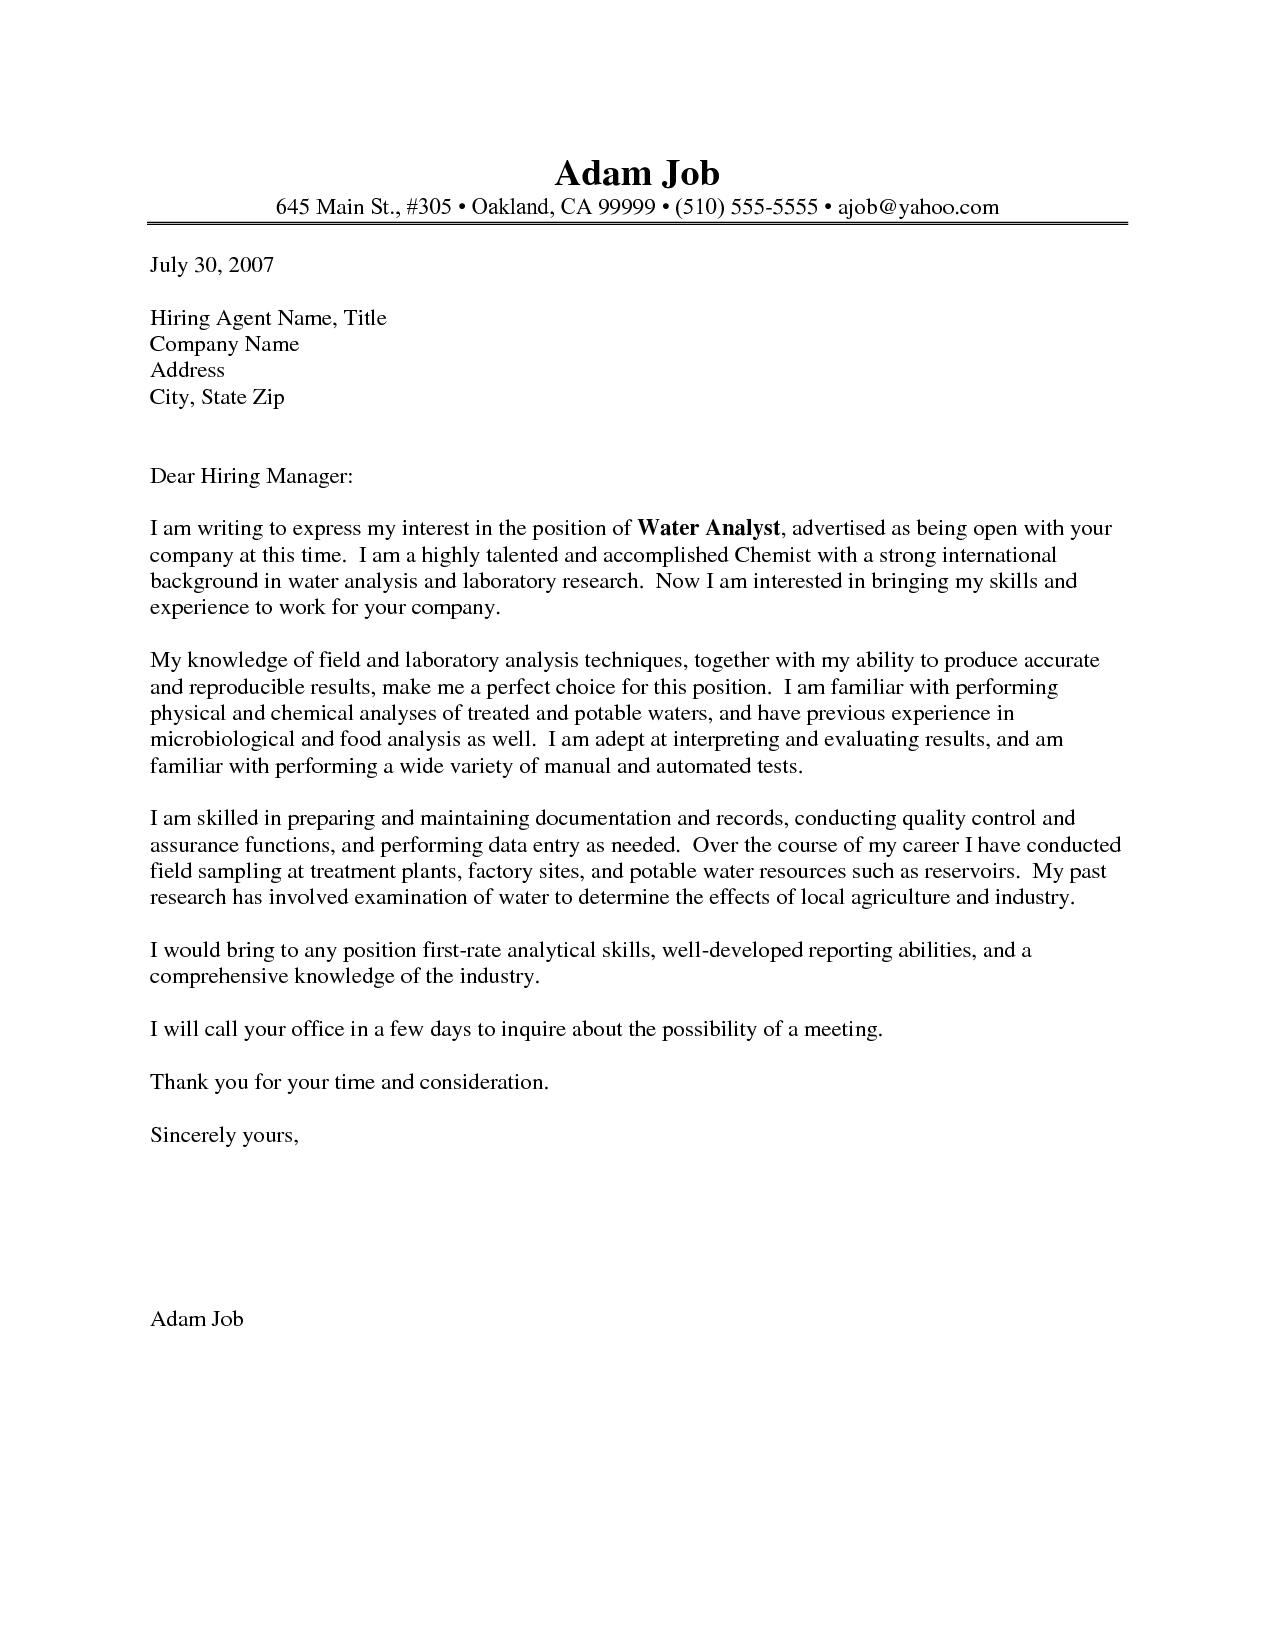 Chemist Cover Letter Sample Resume Chemistry Letters Crime Lab Technician Company Representative Chemistry Letters Chemistry Cover Letter Sample